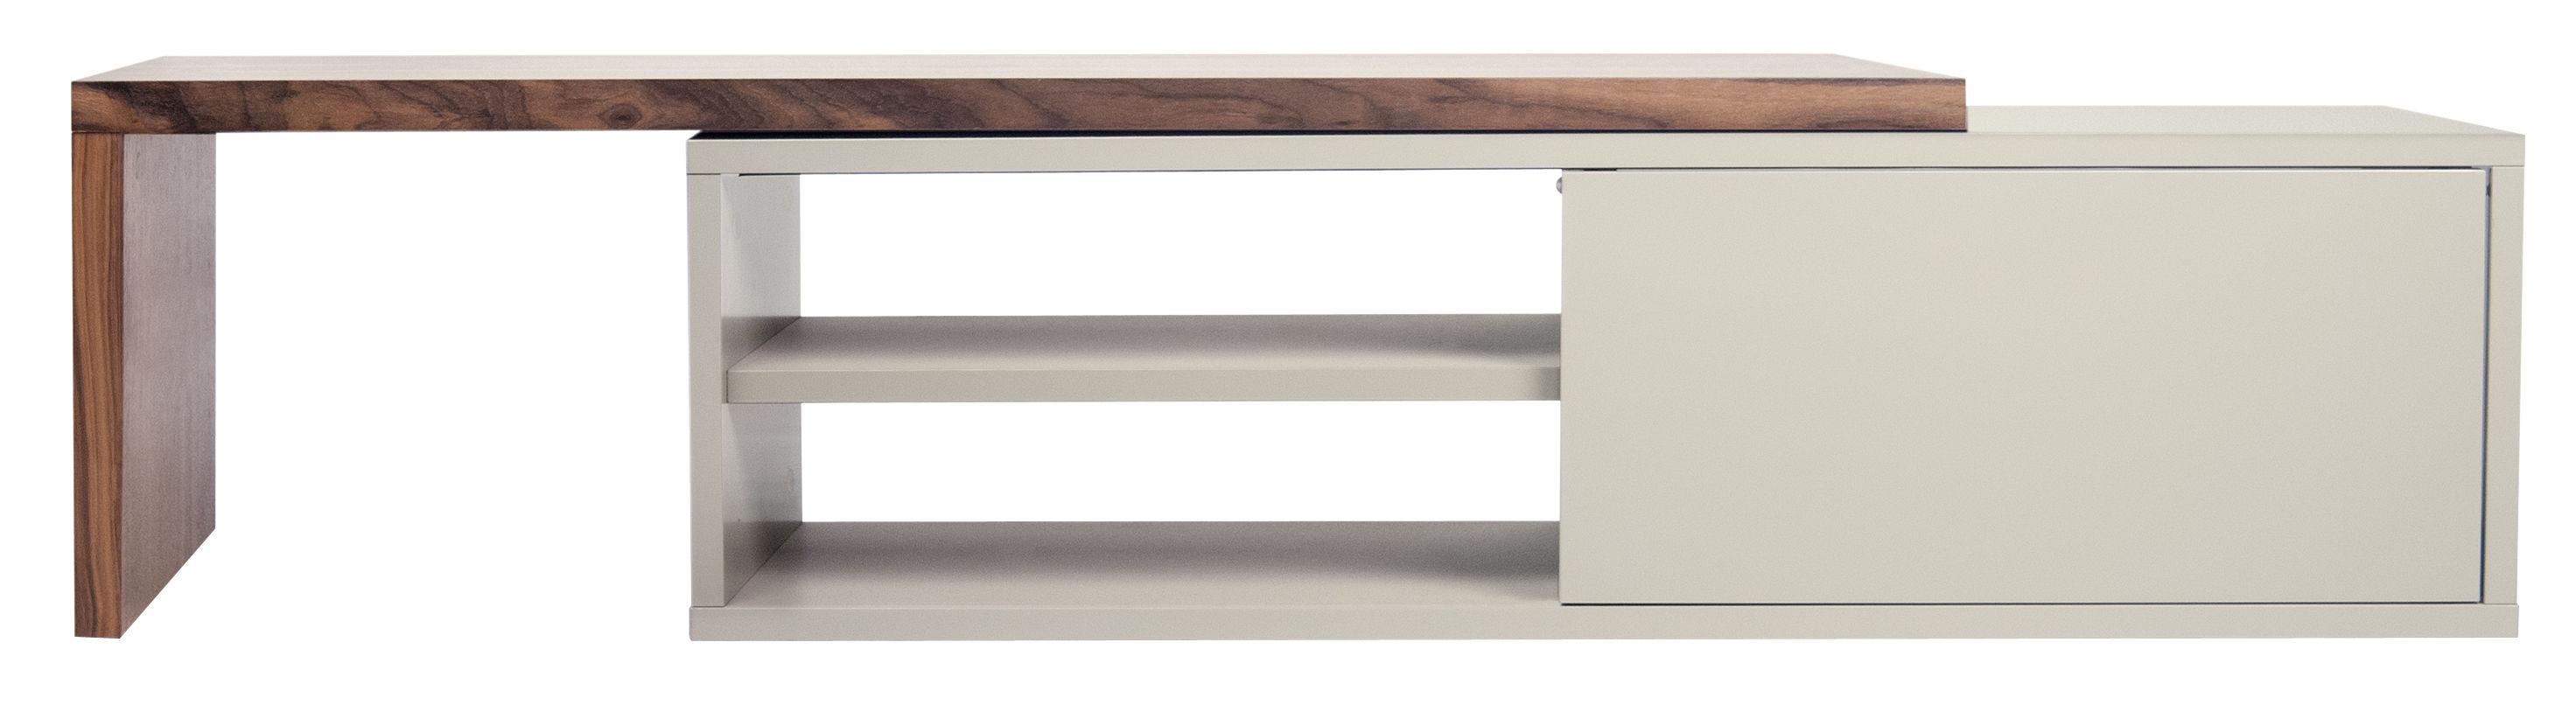 Slide Extensible Tv Cabinet Swivel L 110 To 203 Cm Grey  # Module Meuble Tv